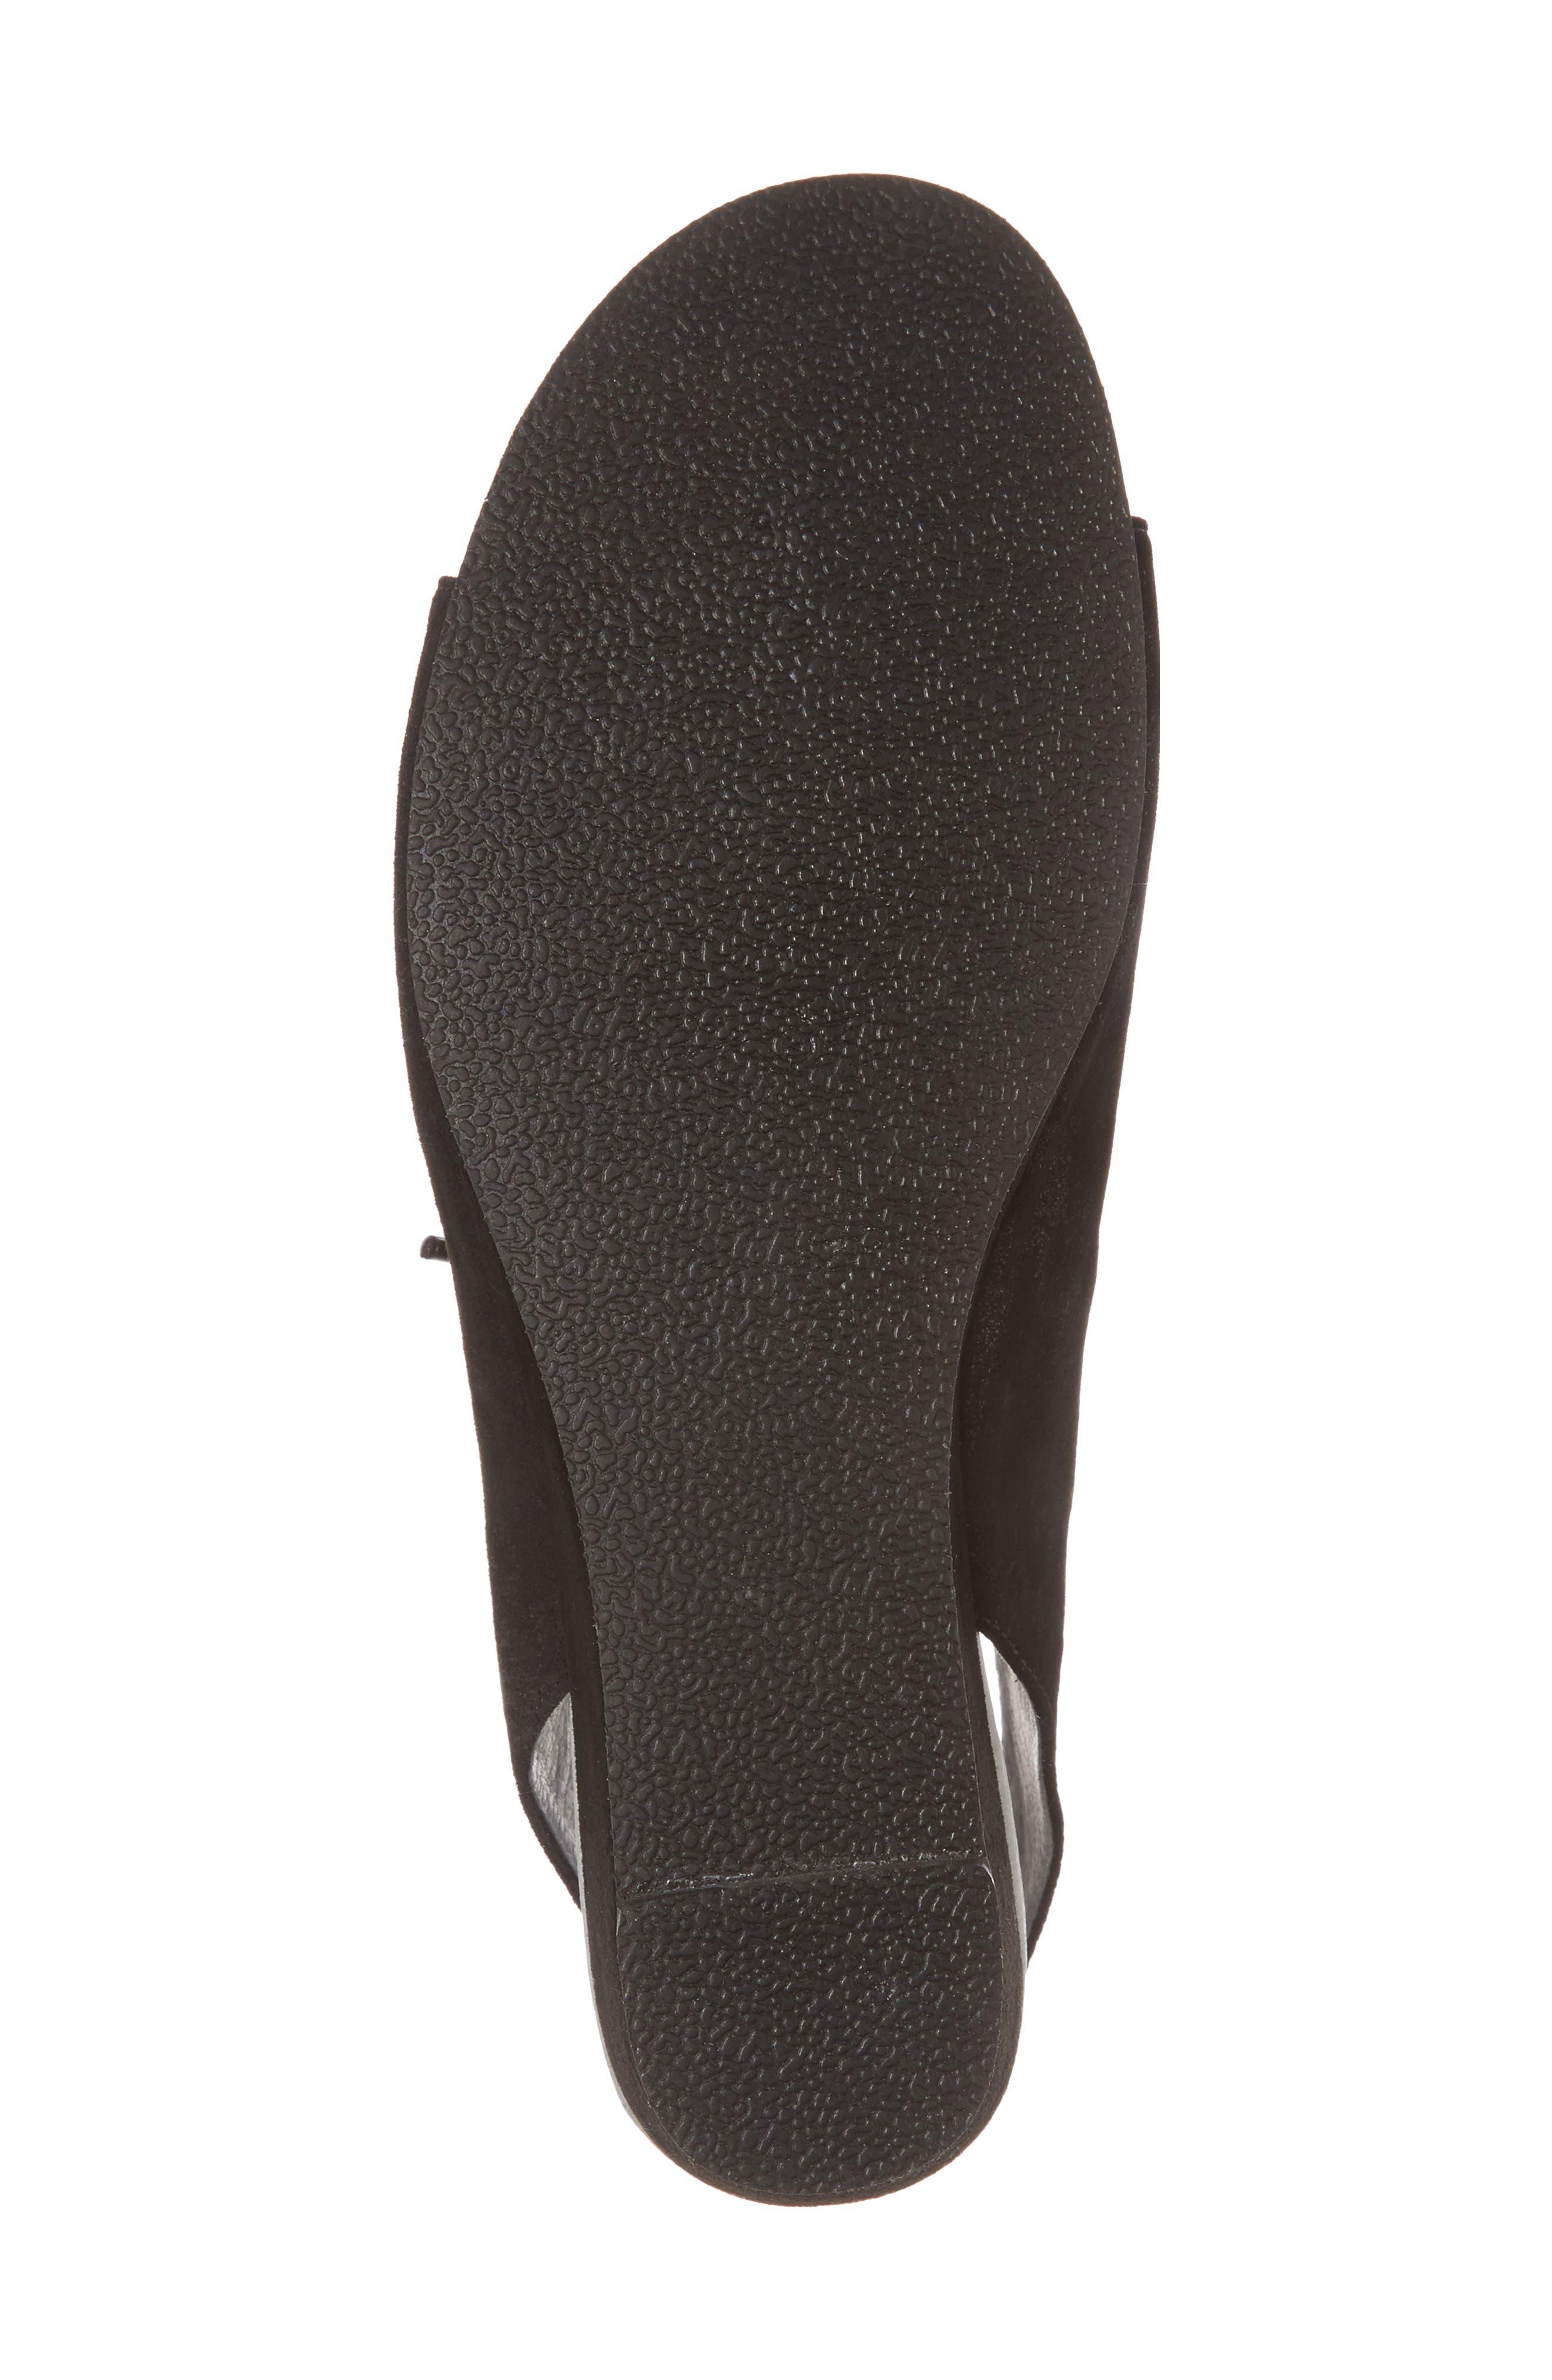 Rich Wedge Sandal,                             Alternate thumbnail 6, color,                             Black Suede